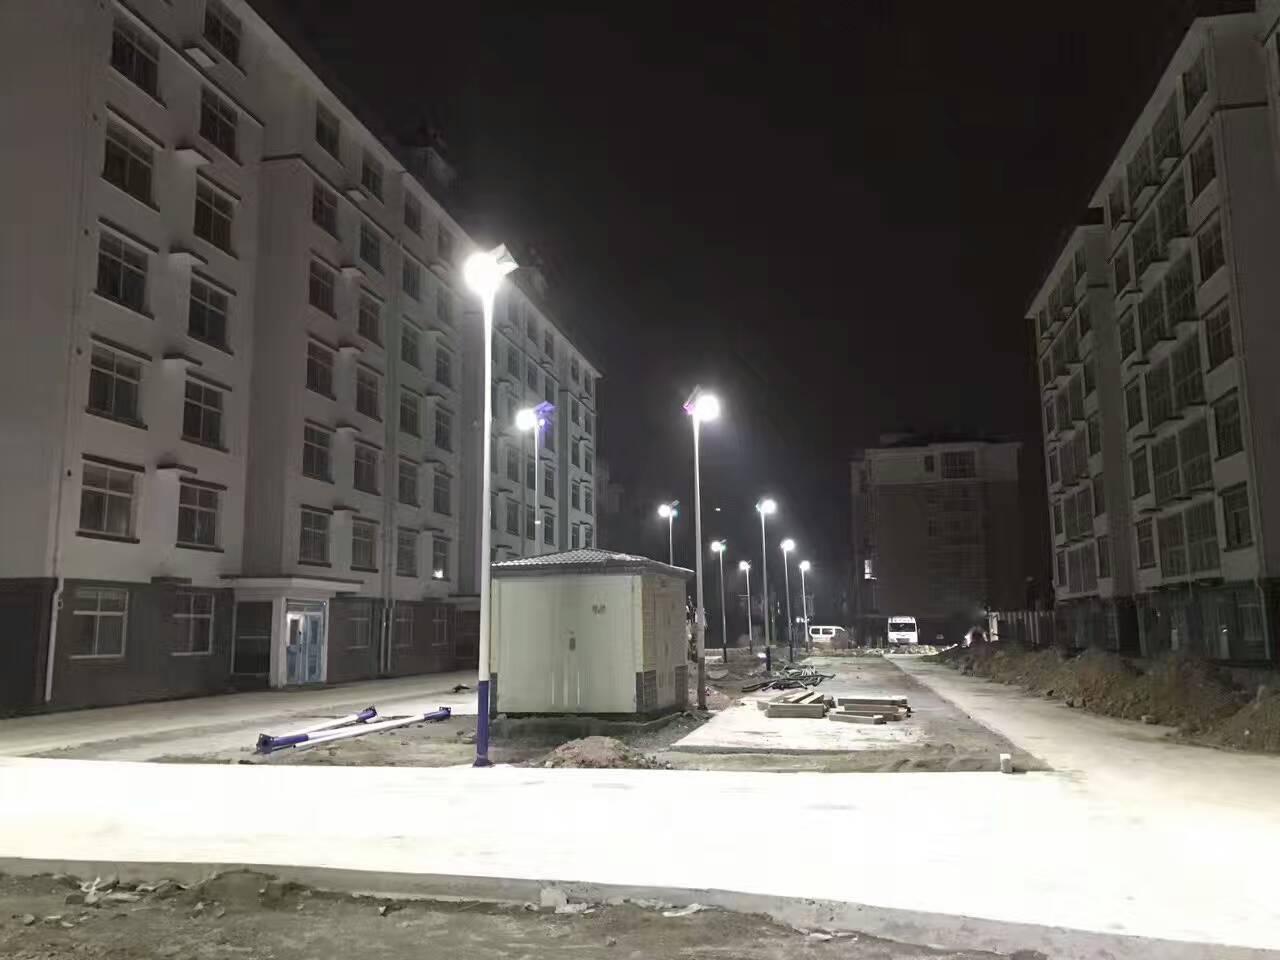 Road Smart-Solar Sidewalk Light Customization, Solar Lamp Post Lights | Road Smart-16